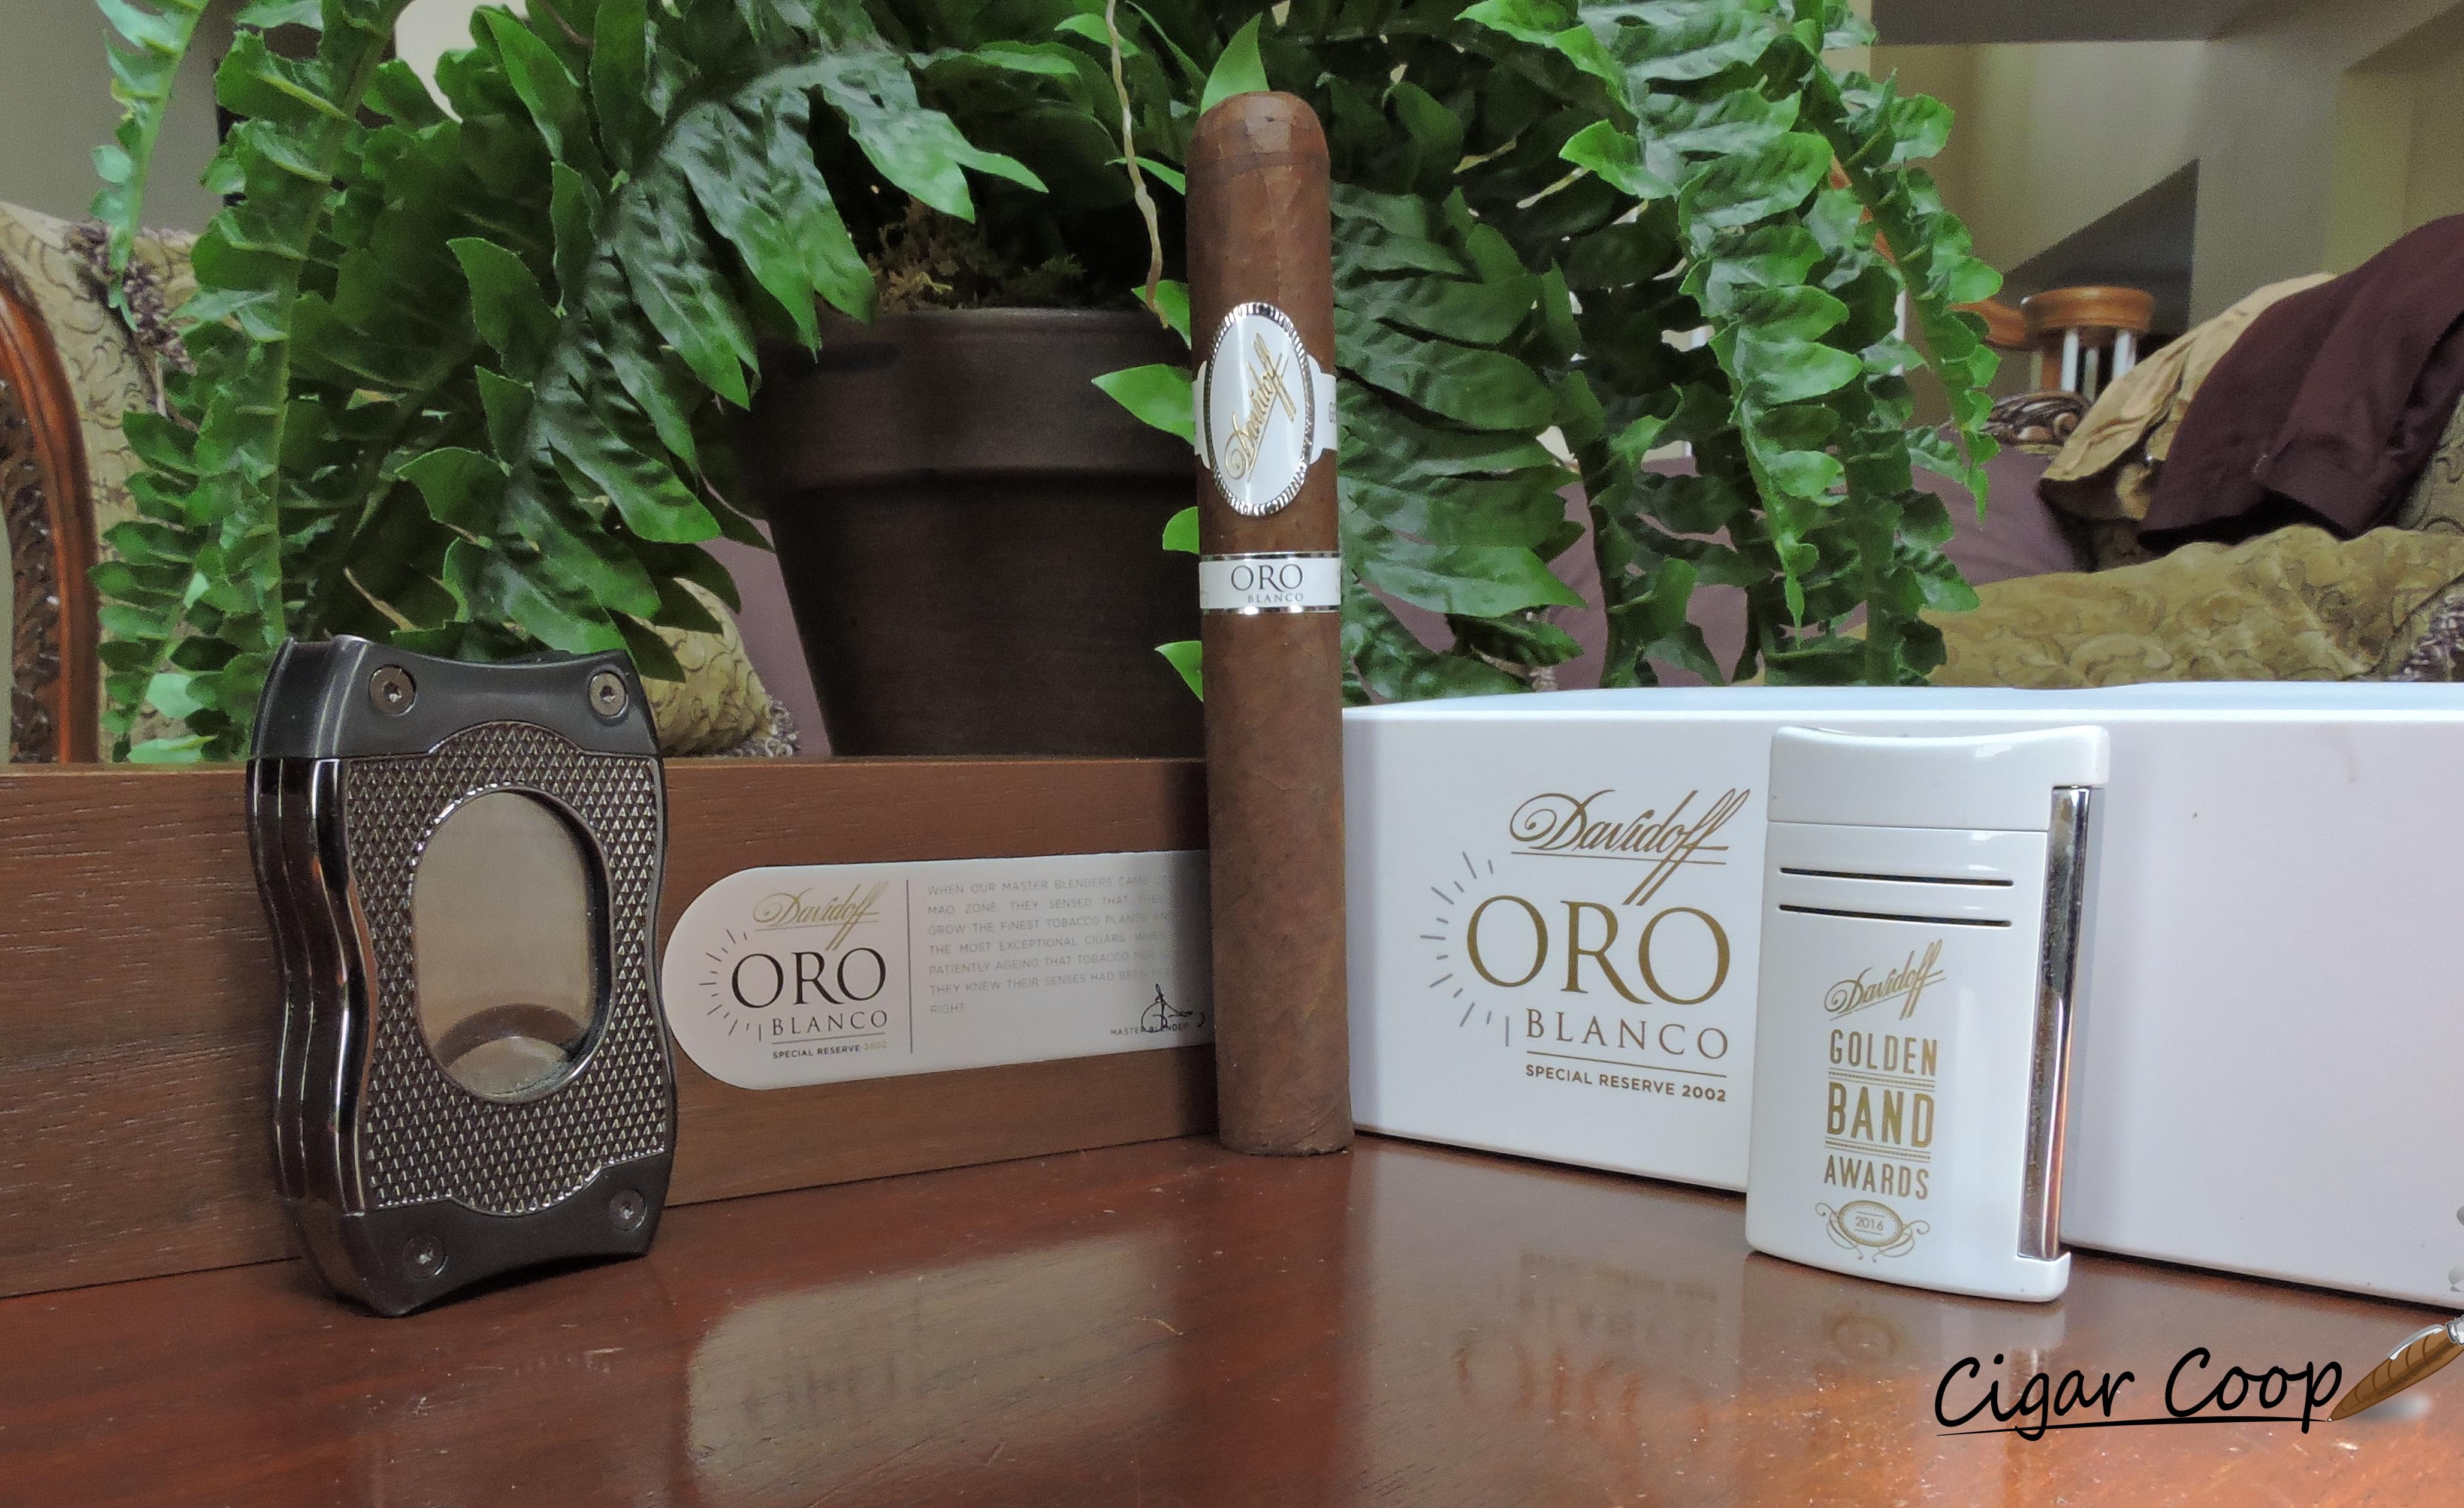 Davidoff Oro Blanco-Tools